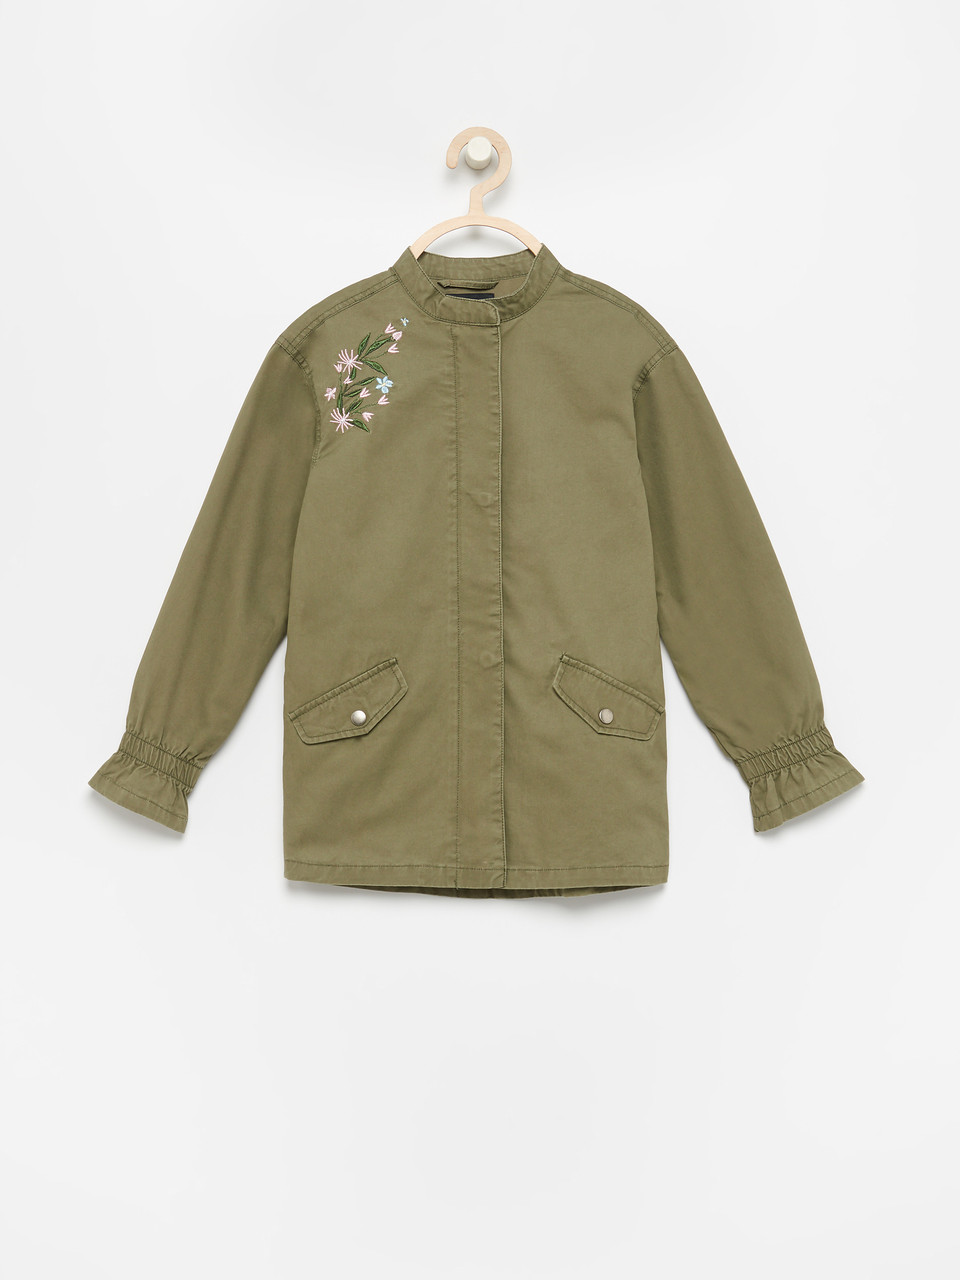 Хлопковая куртка-тракер с вышивкой комуфляжная Reserved р.134, 140, 146, 152, 158